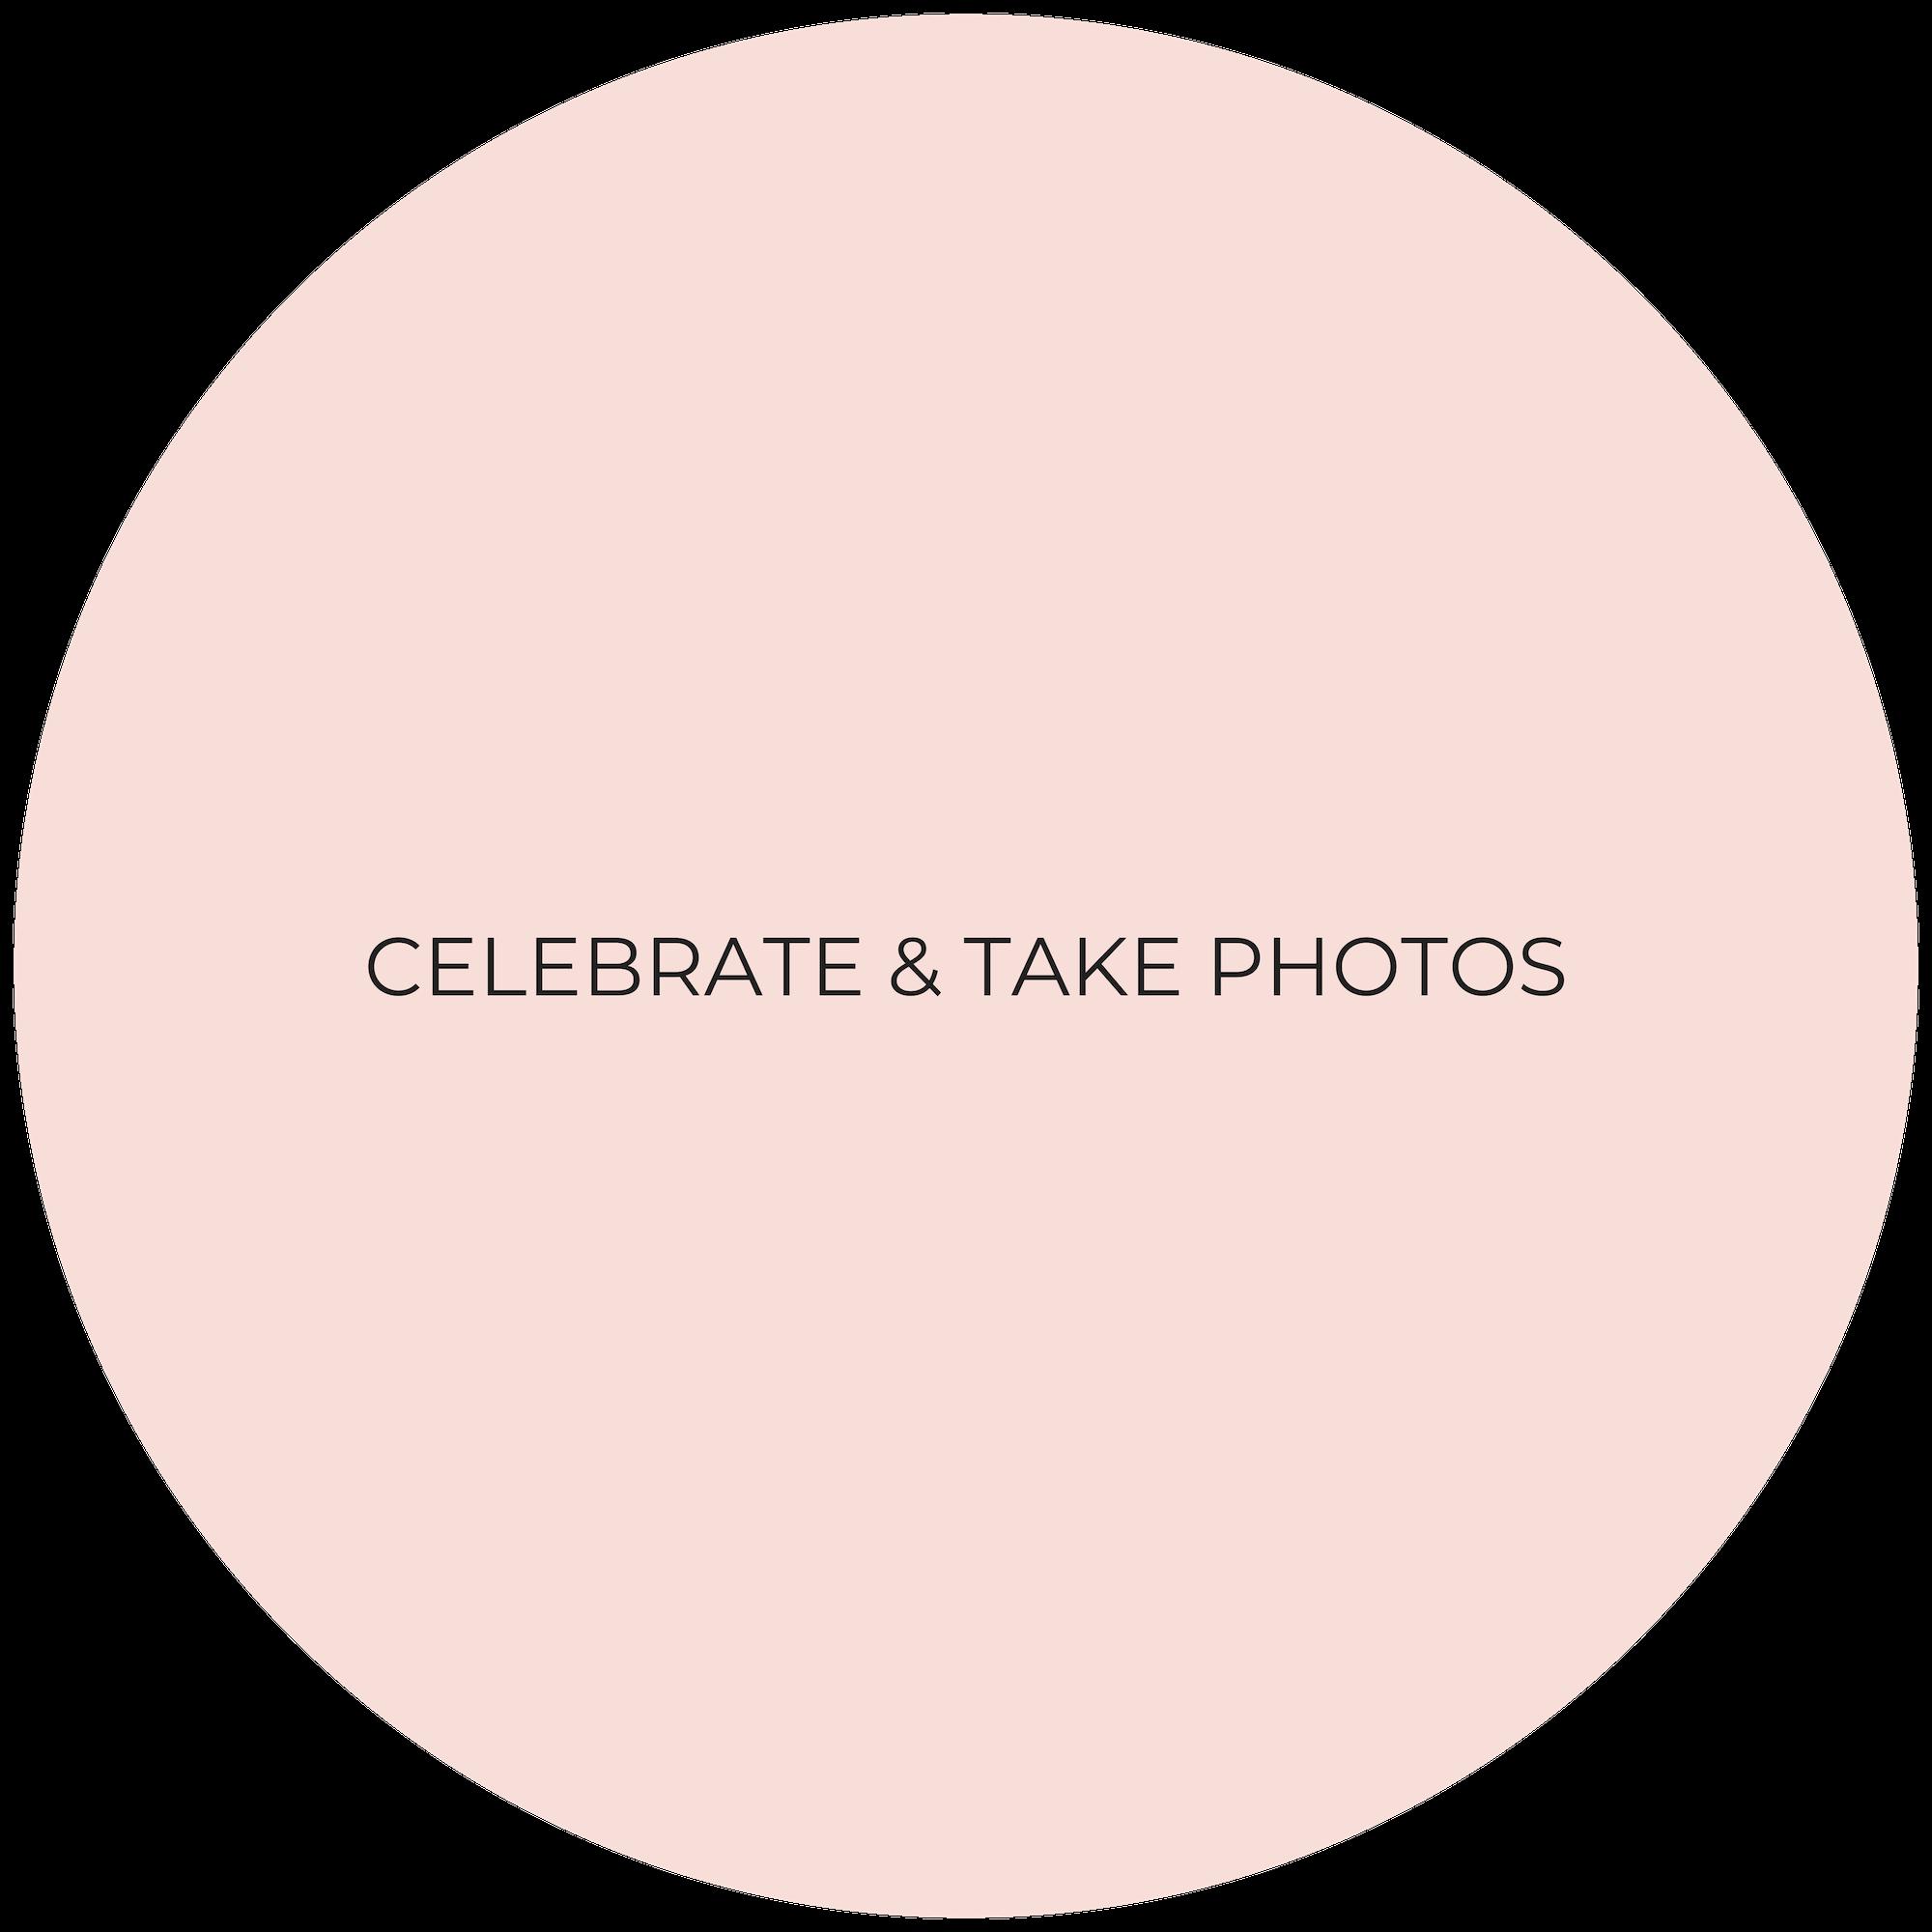 lt pink circle image (2).png